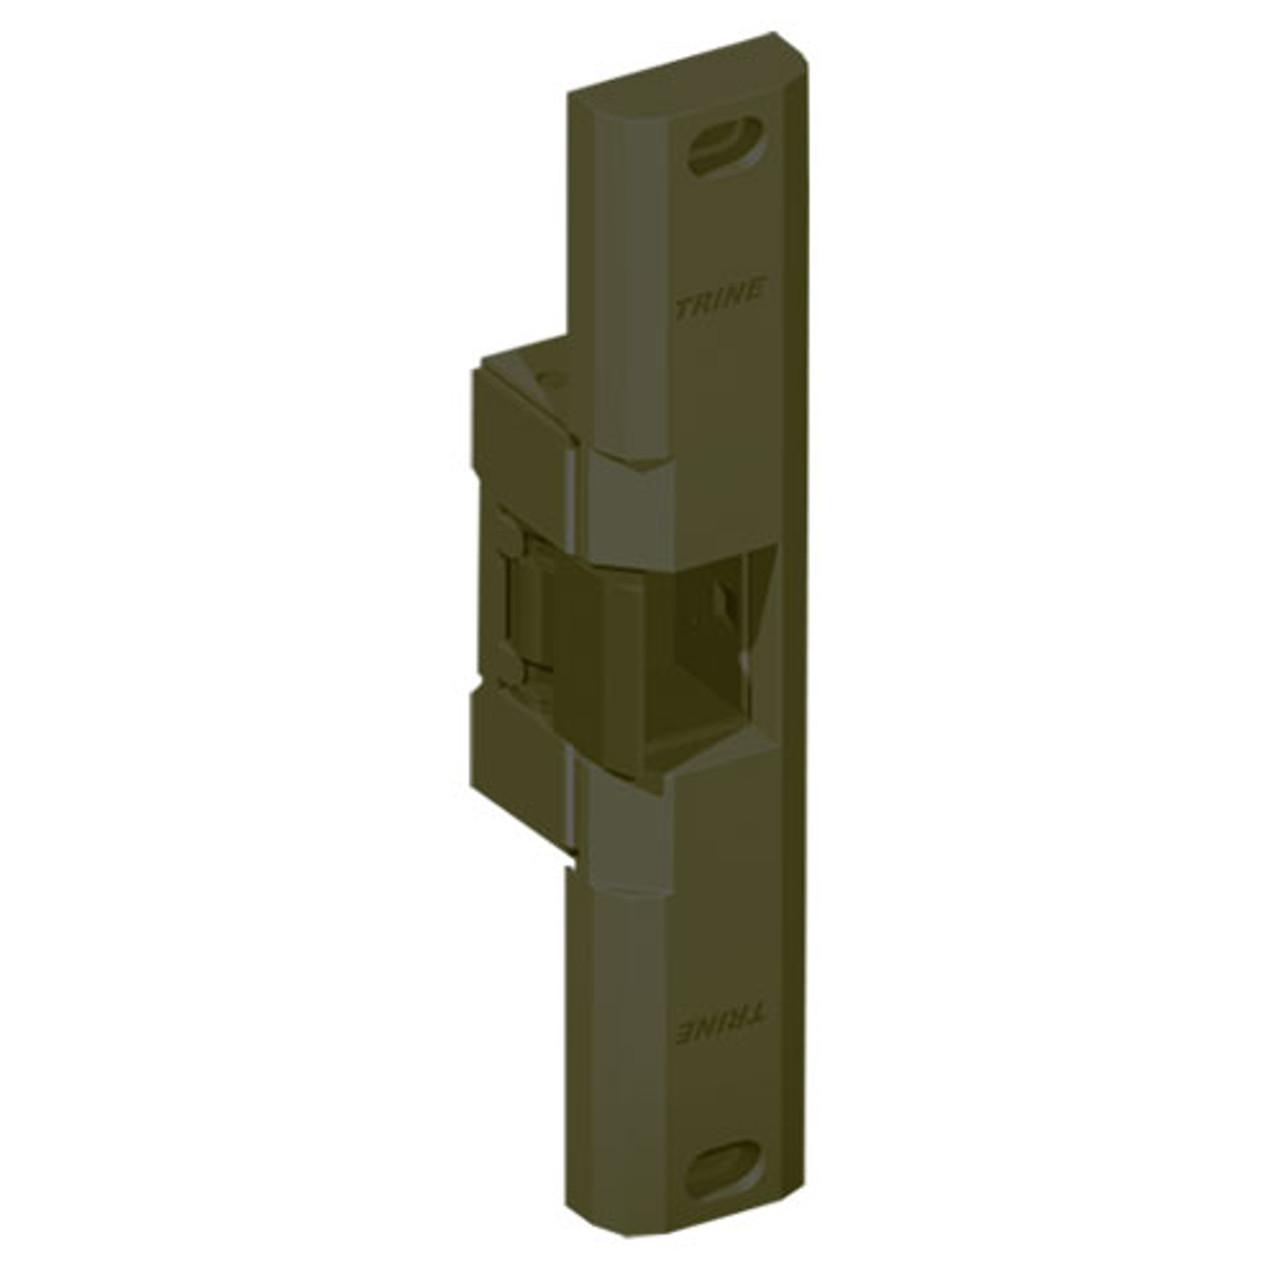 EN850-12DC-US10B-LH Trine EN Series Great for Outdoor Gates Electric Strikes in Dark Bronze Finish